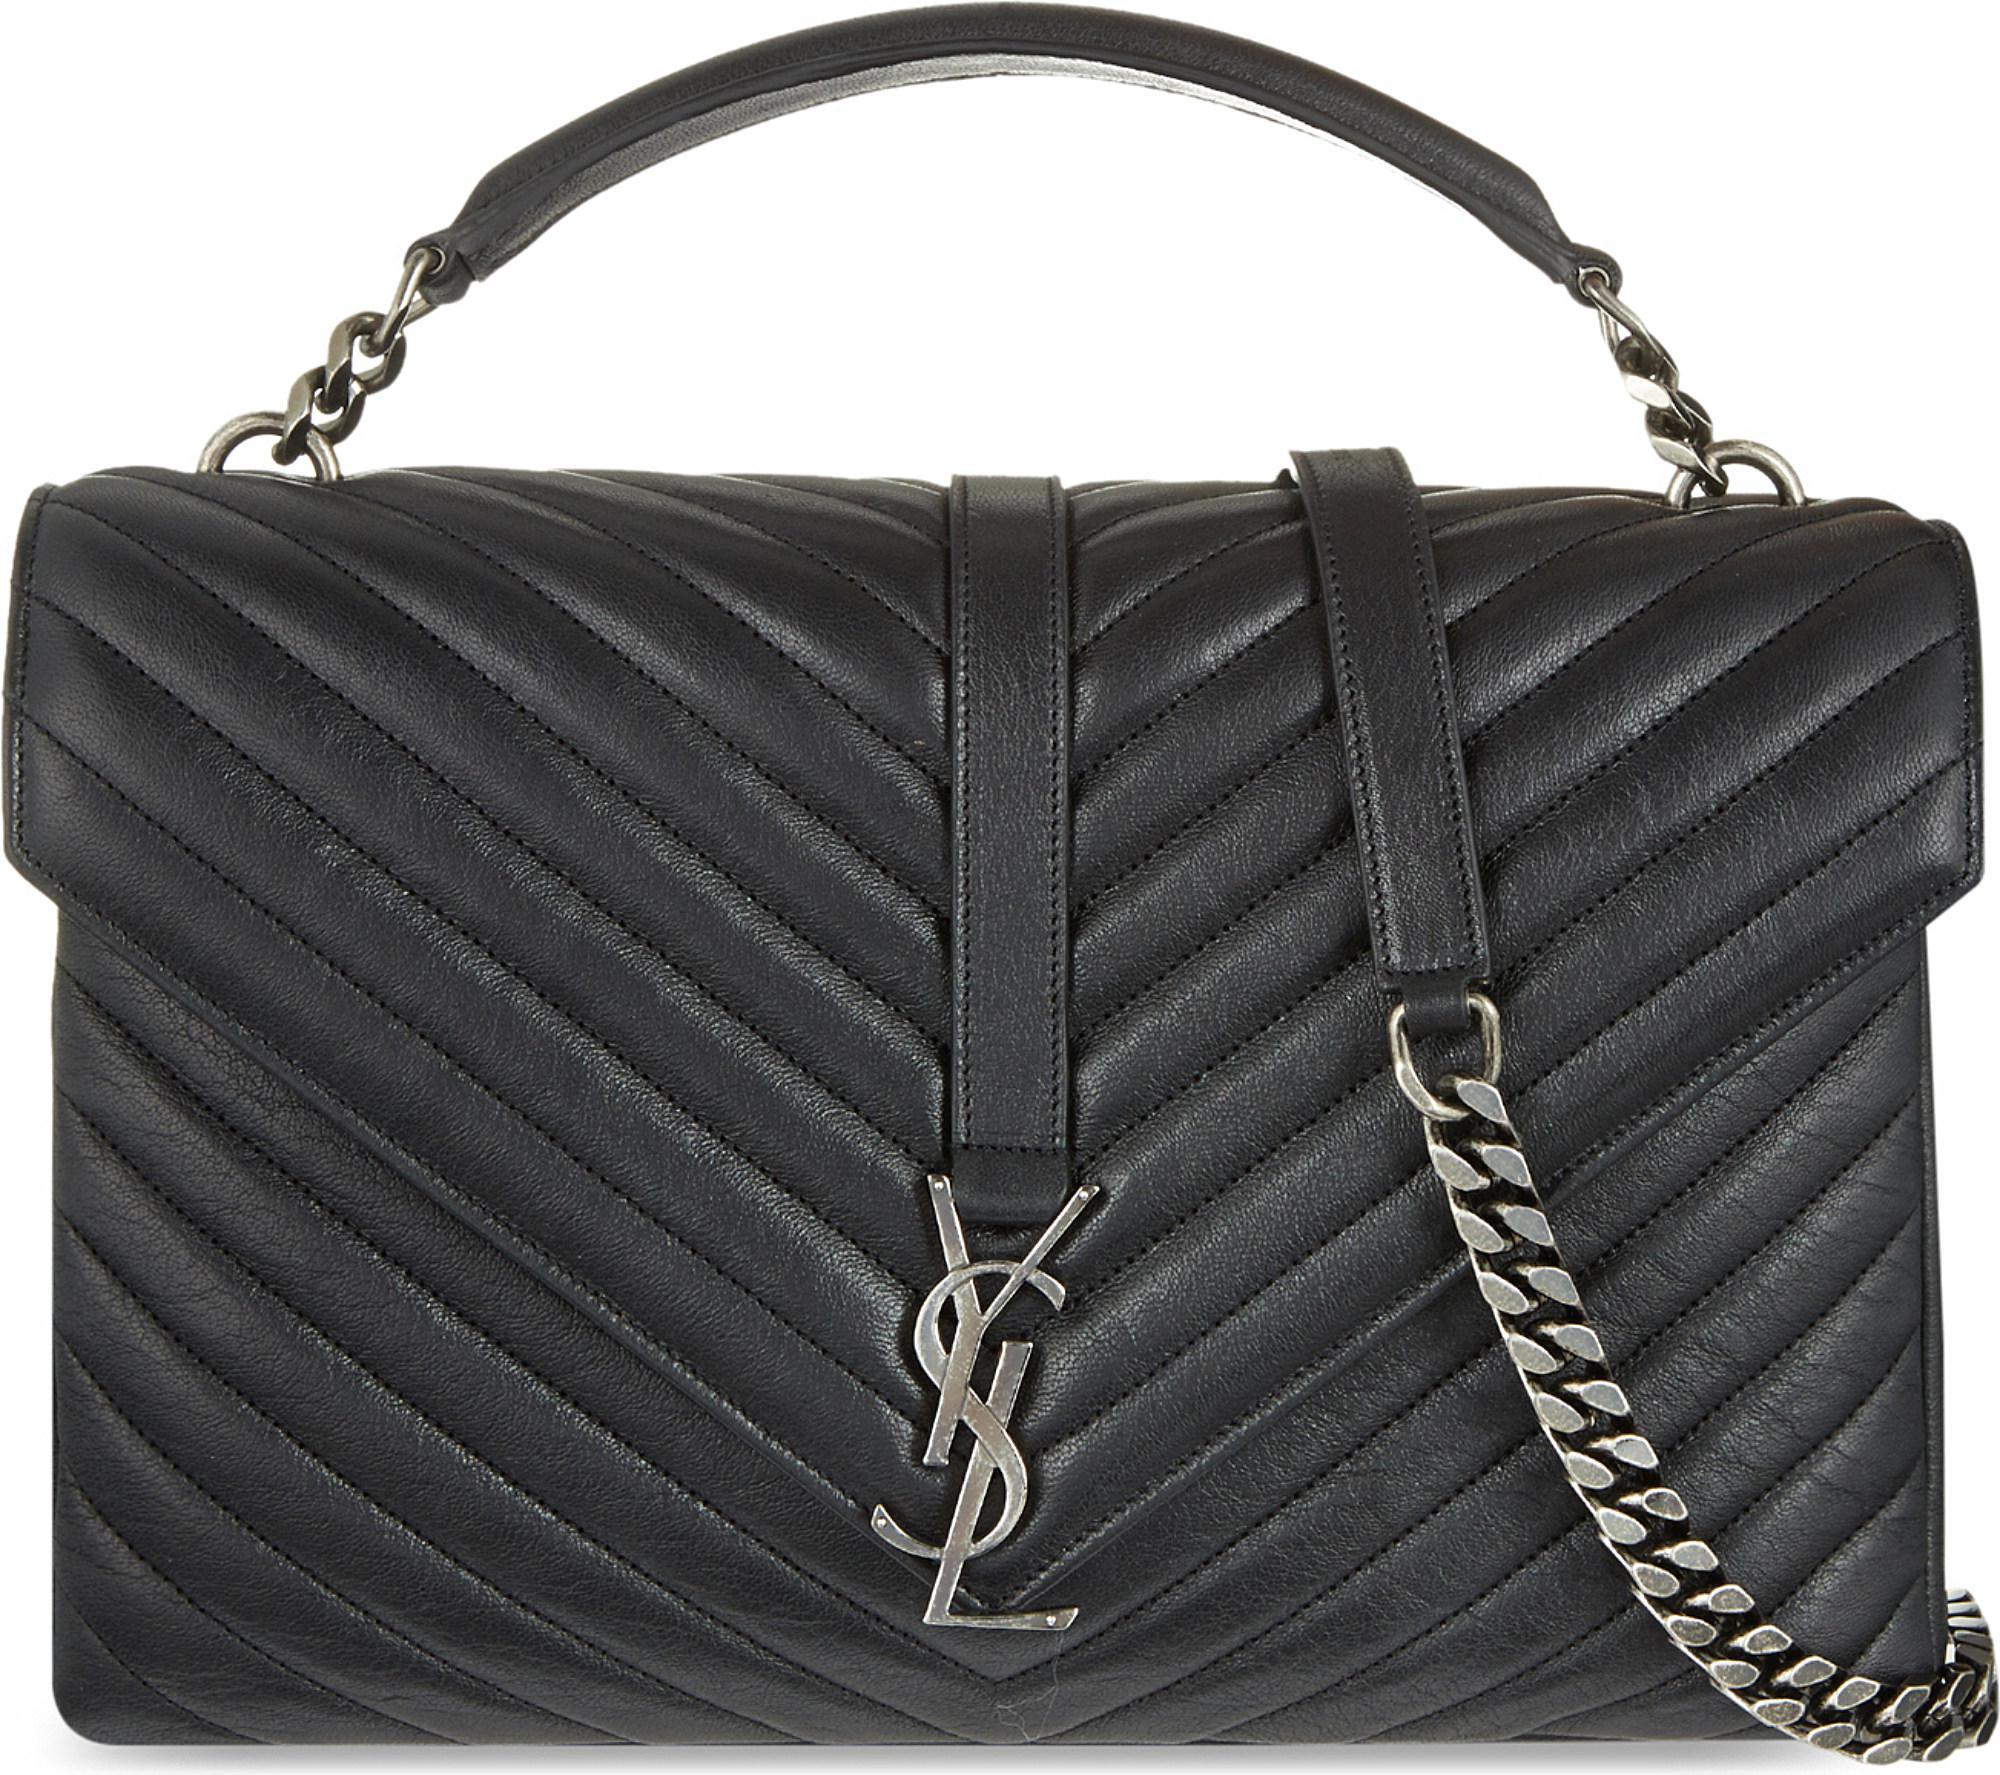 c4821ad8973 Saint Laurent. Women's Black Monogram College Quilted Leather Shoulder Bag